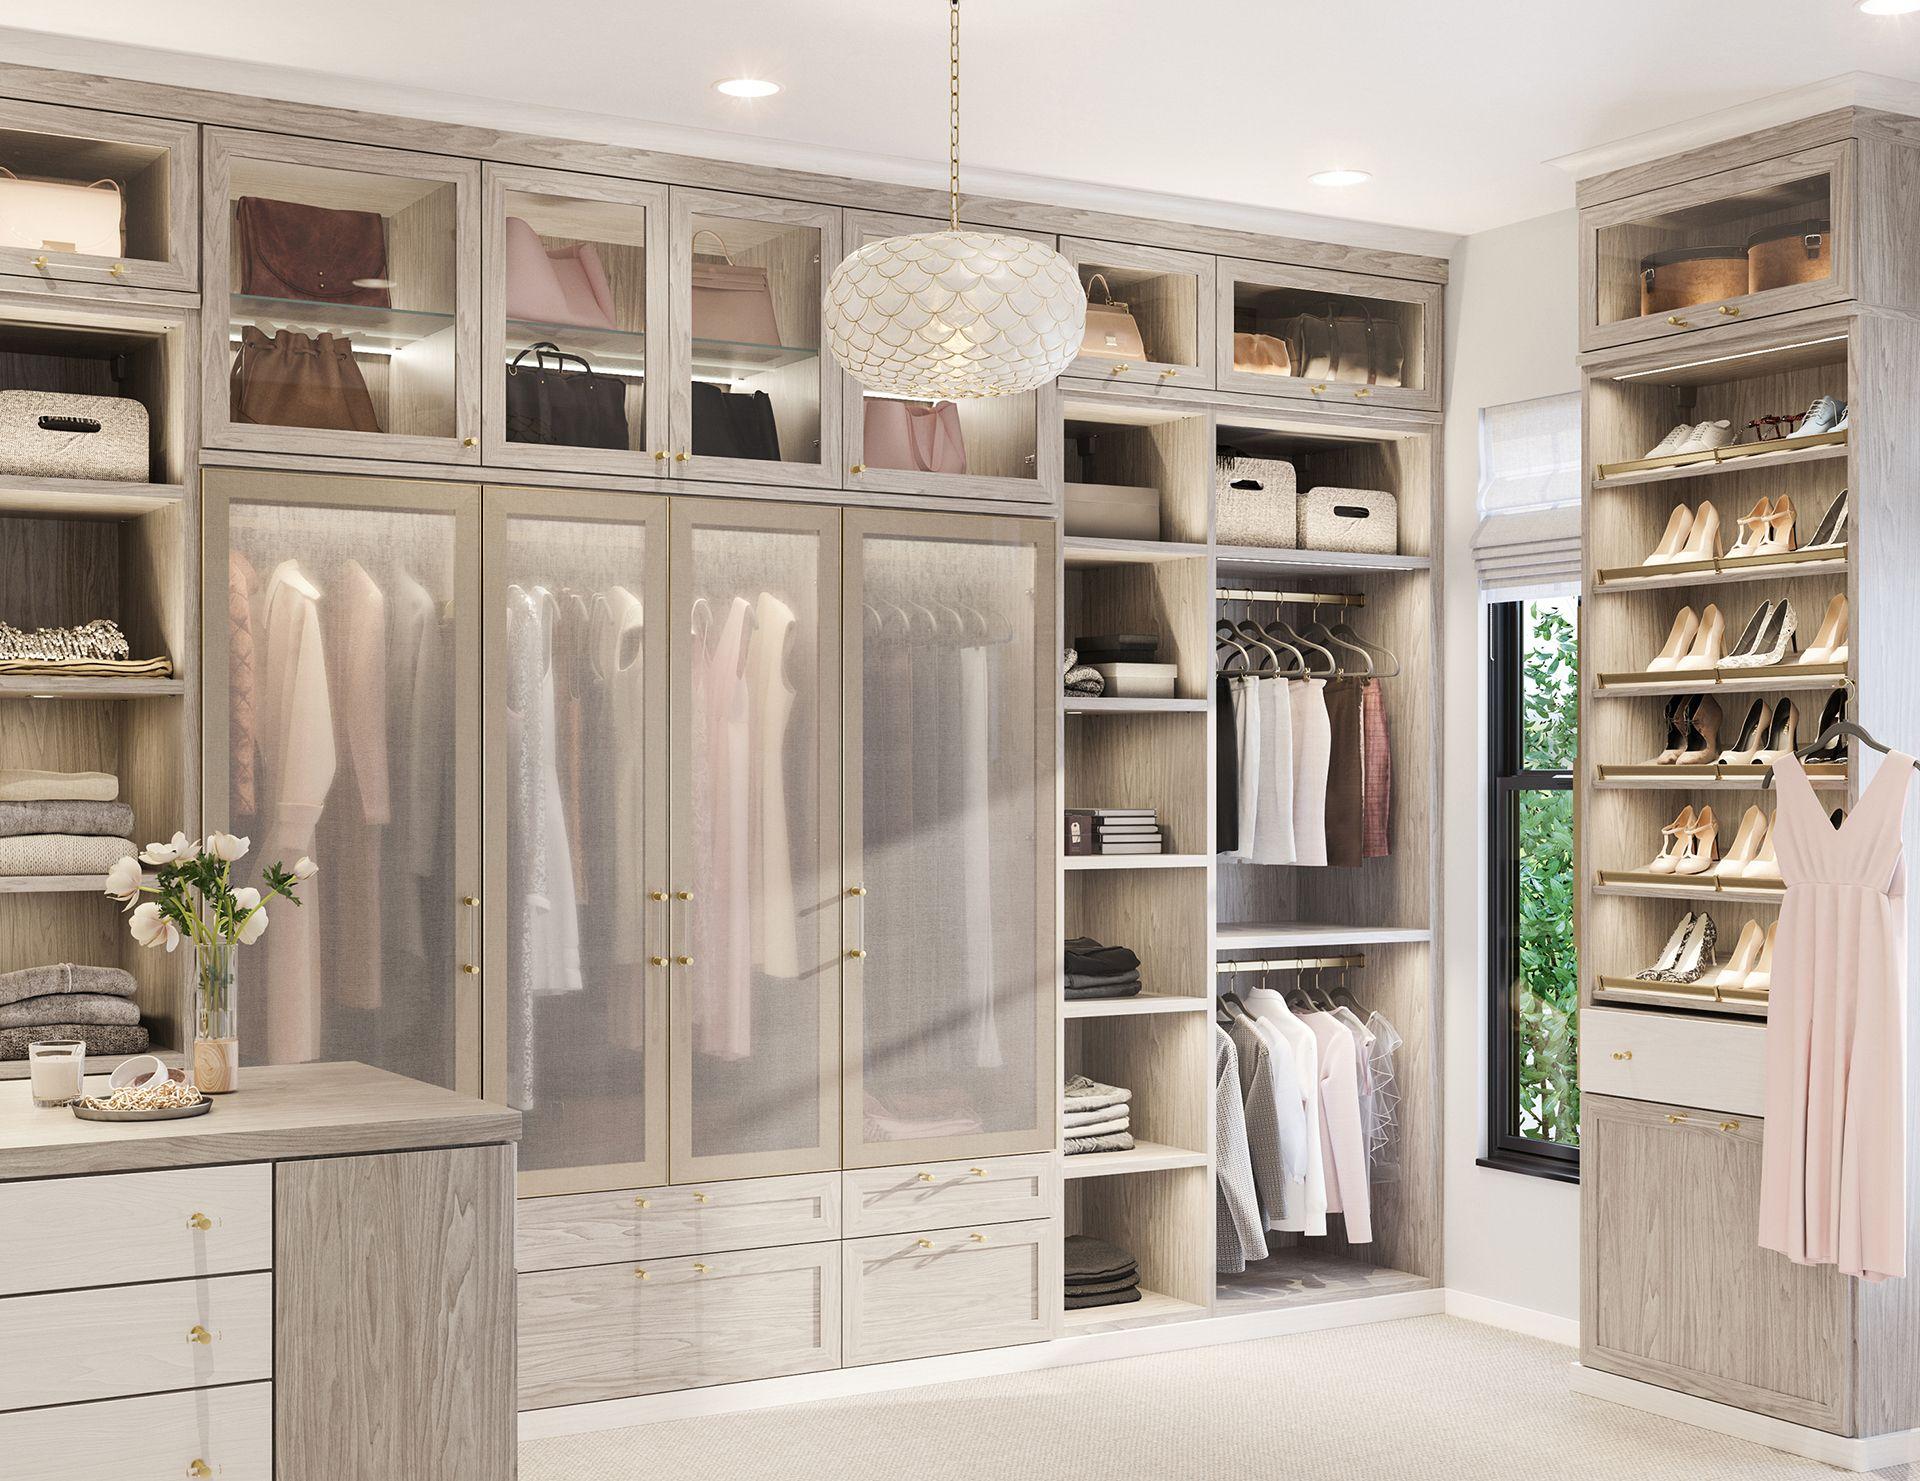 Walk In Closet Systems | Walk-In Closet Design Ideas ...